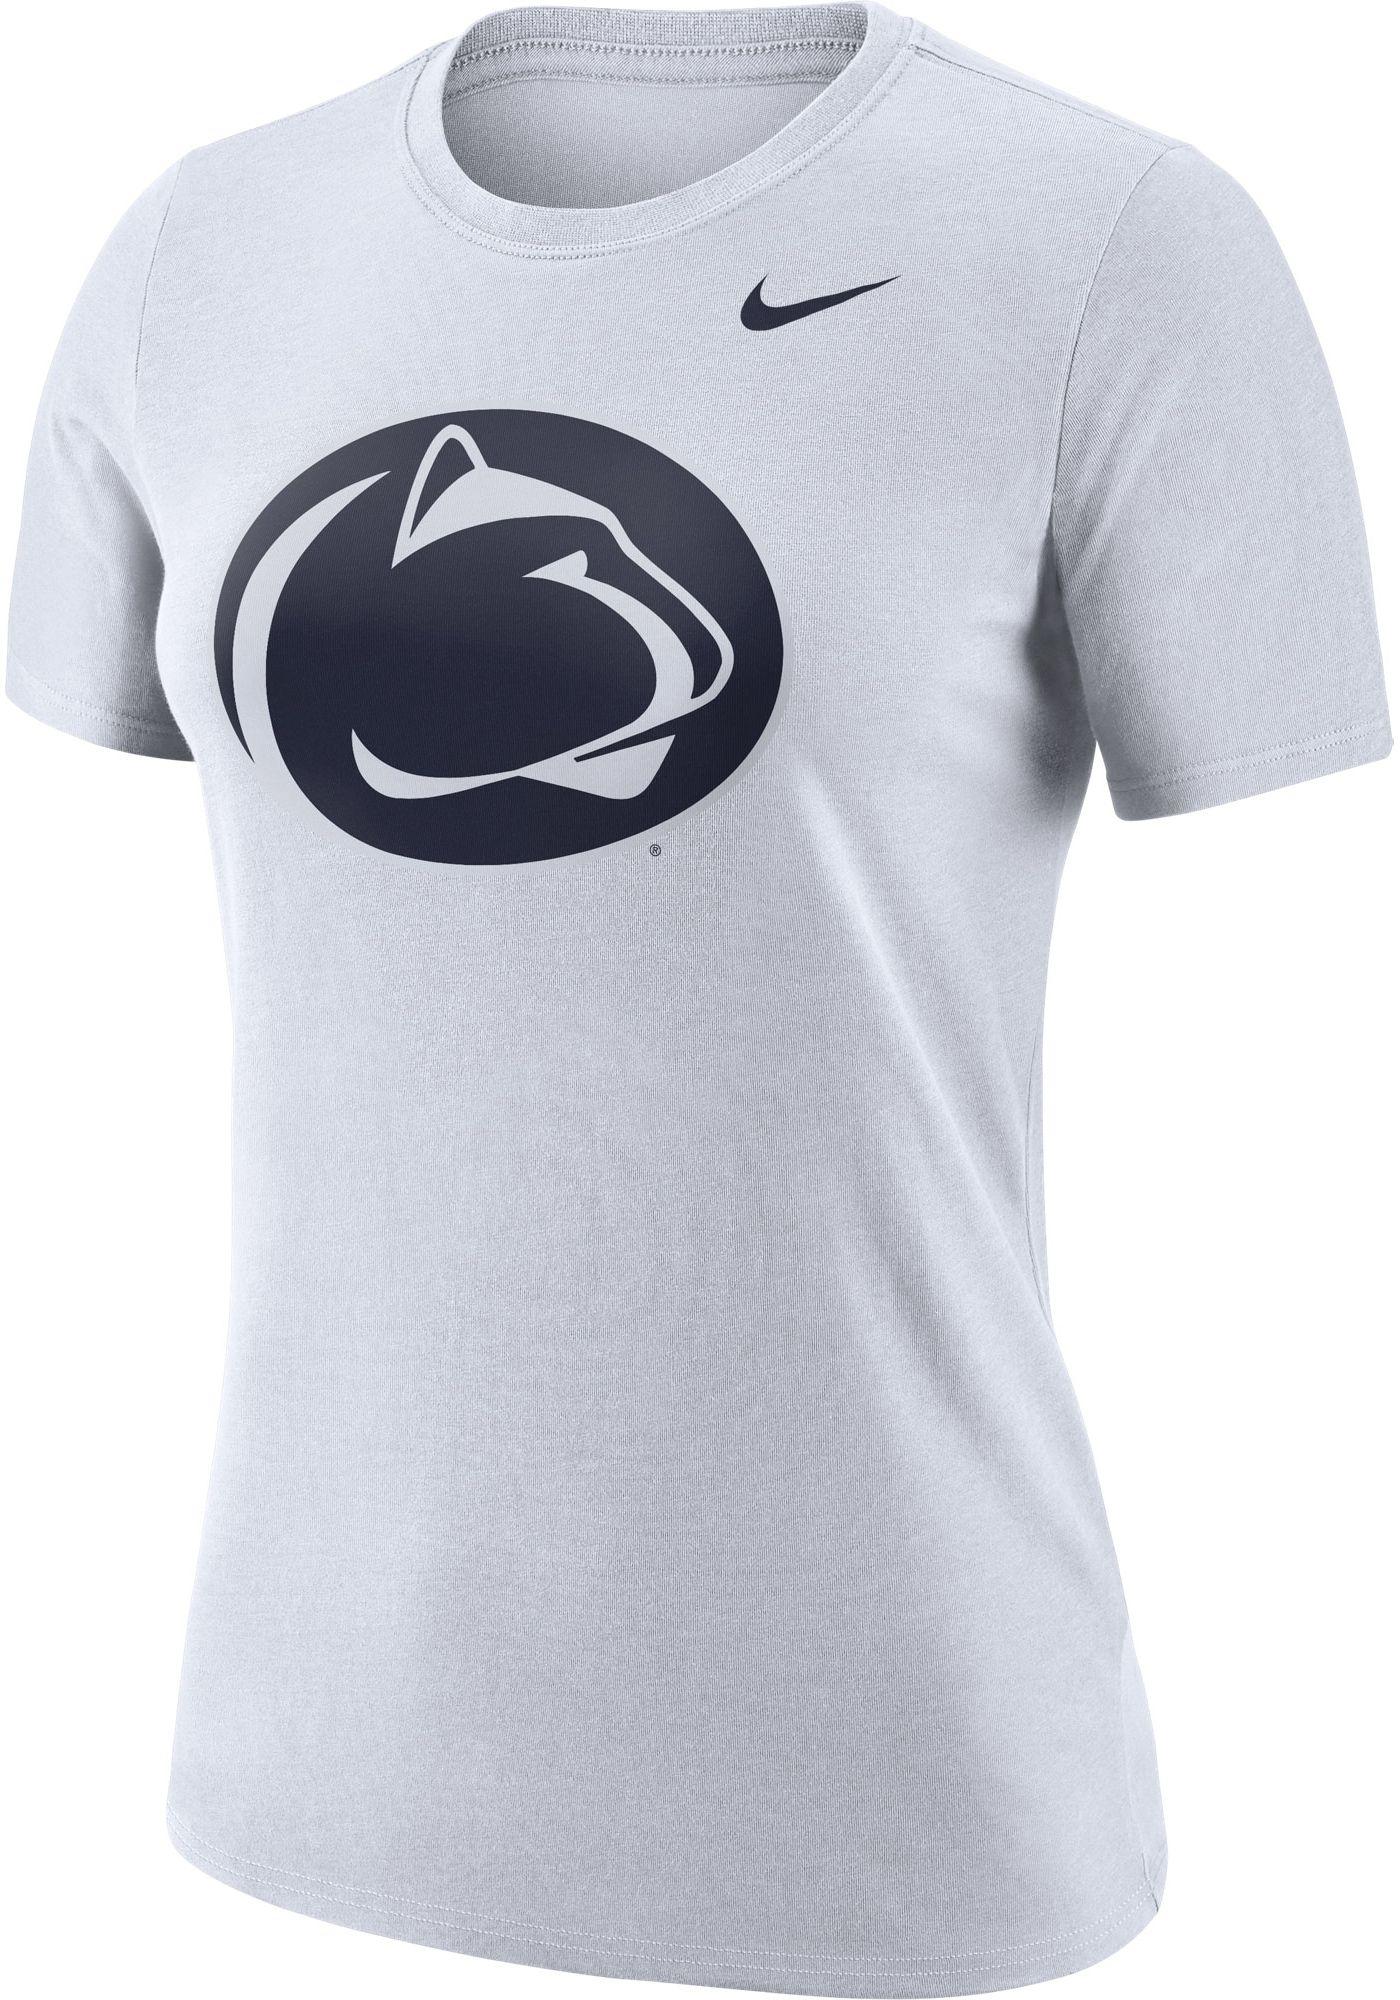 Nike Women's Penn State Nittany Lions Dri-FIT Logo Crew White T-Shirt